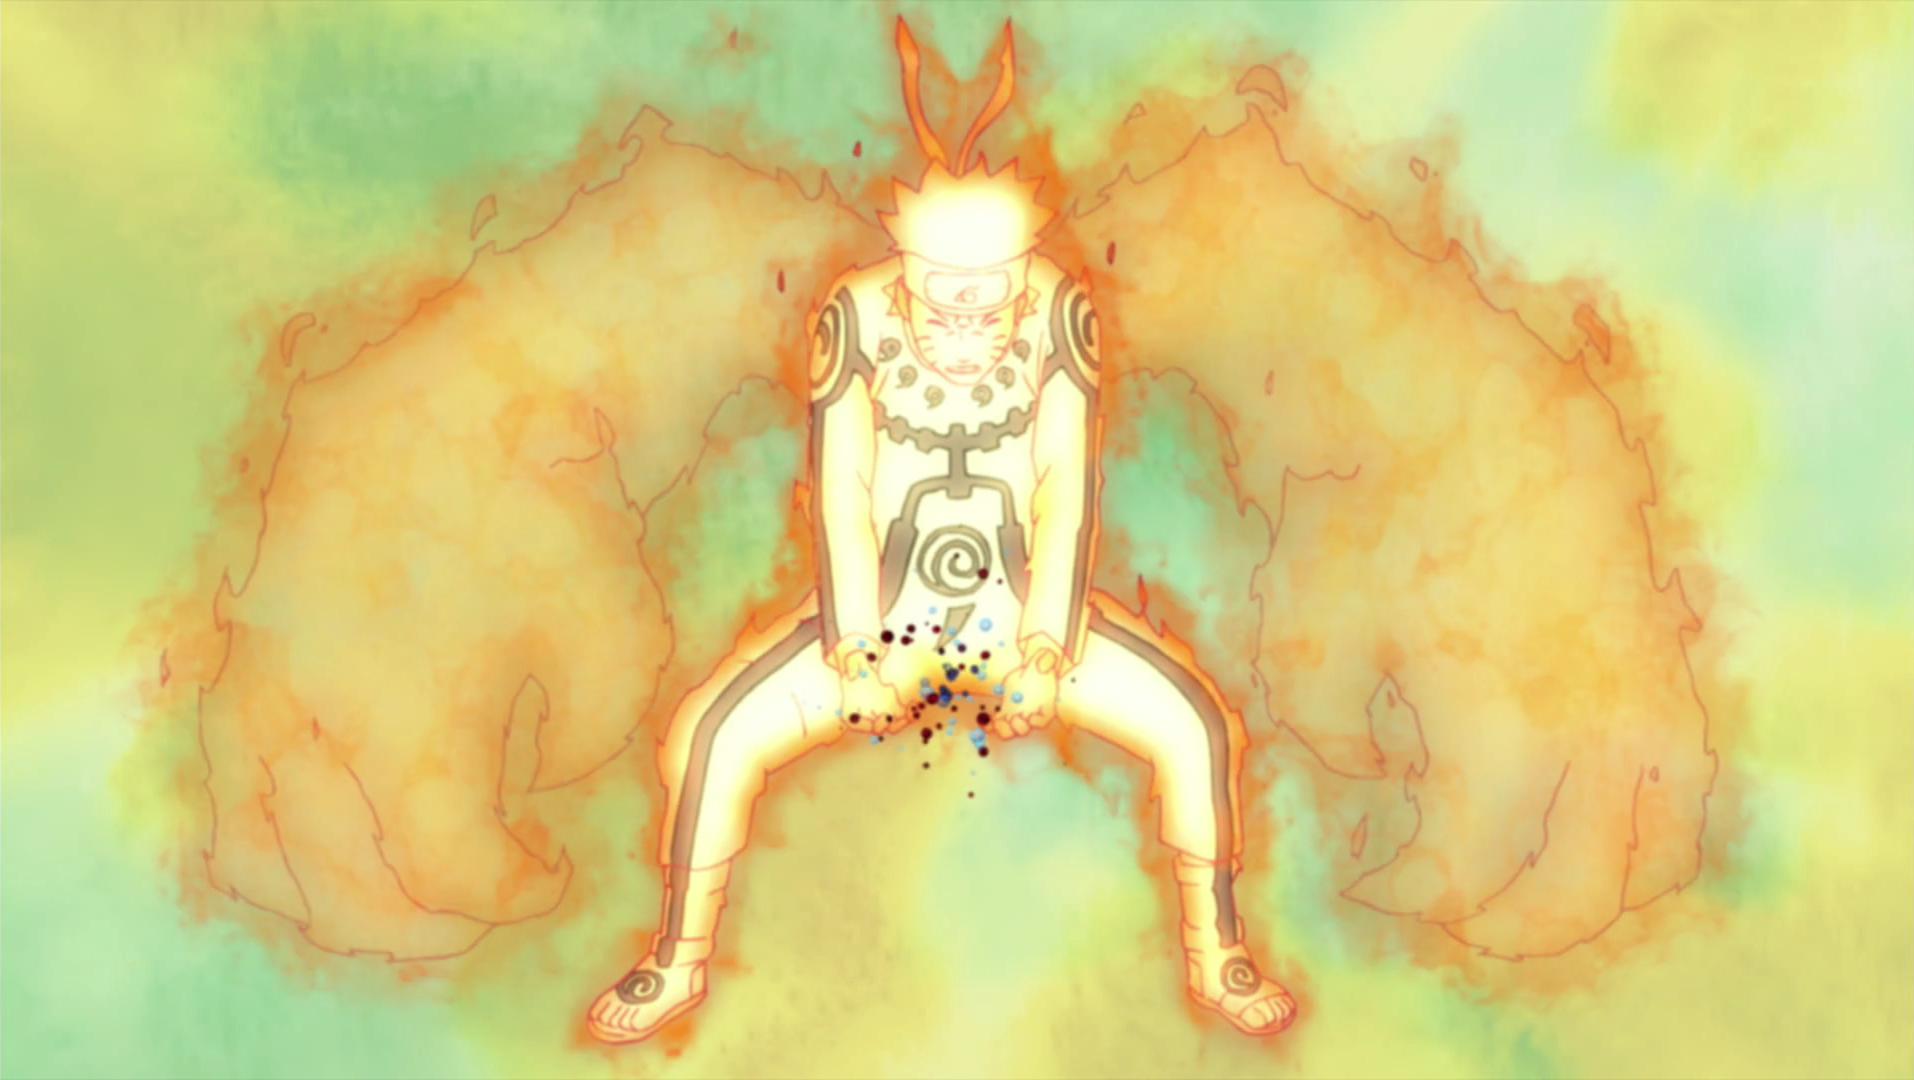 Naruto | Naruto Fan Fiction Wiki | FANDOM powered by Wikia